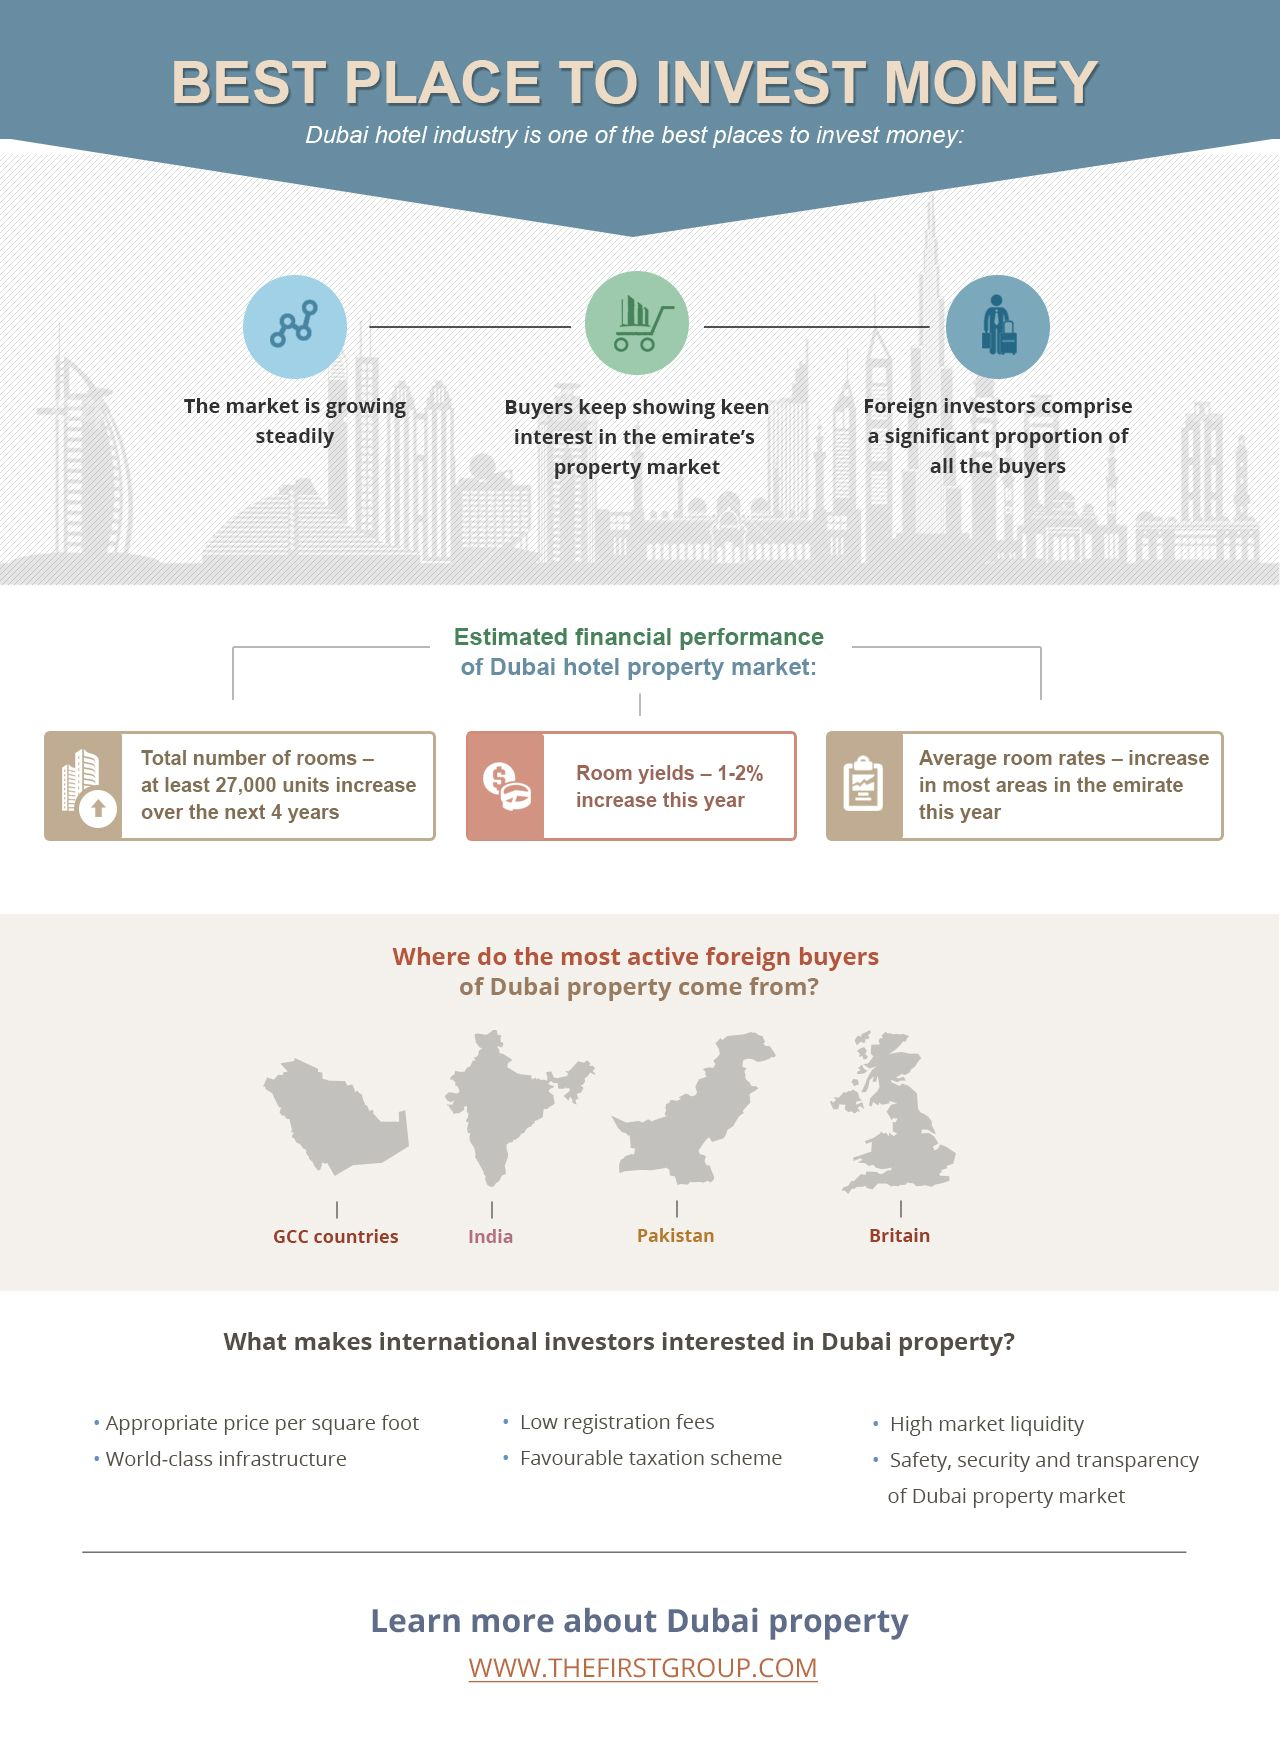 Dubai Property Investments Opportunity Dubai Investments With Investing Investing Money Dubai Hotel